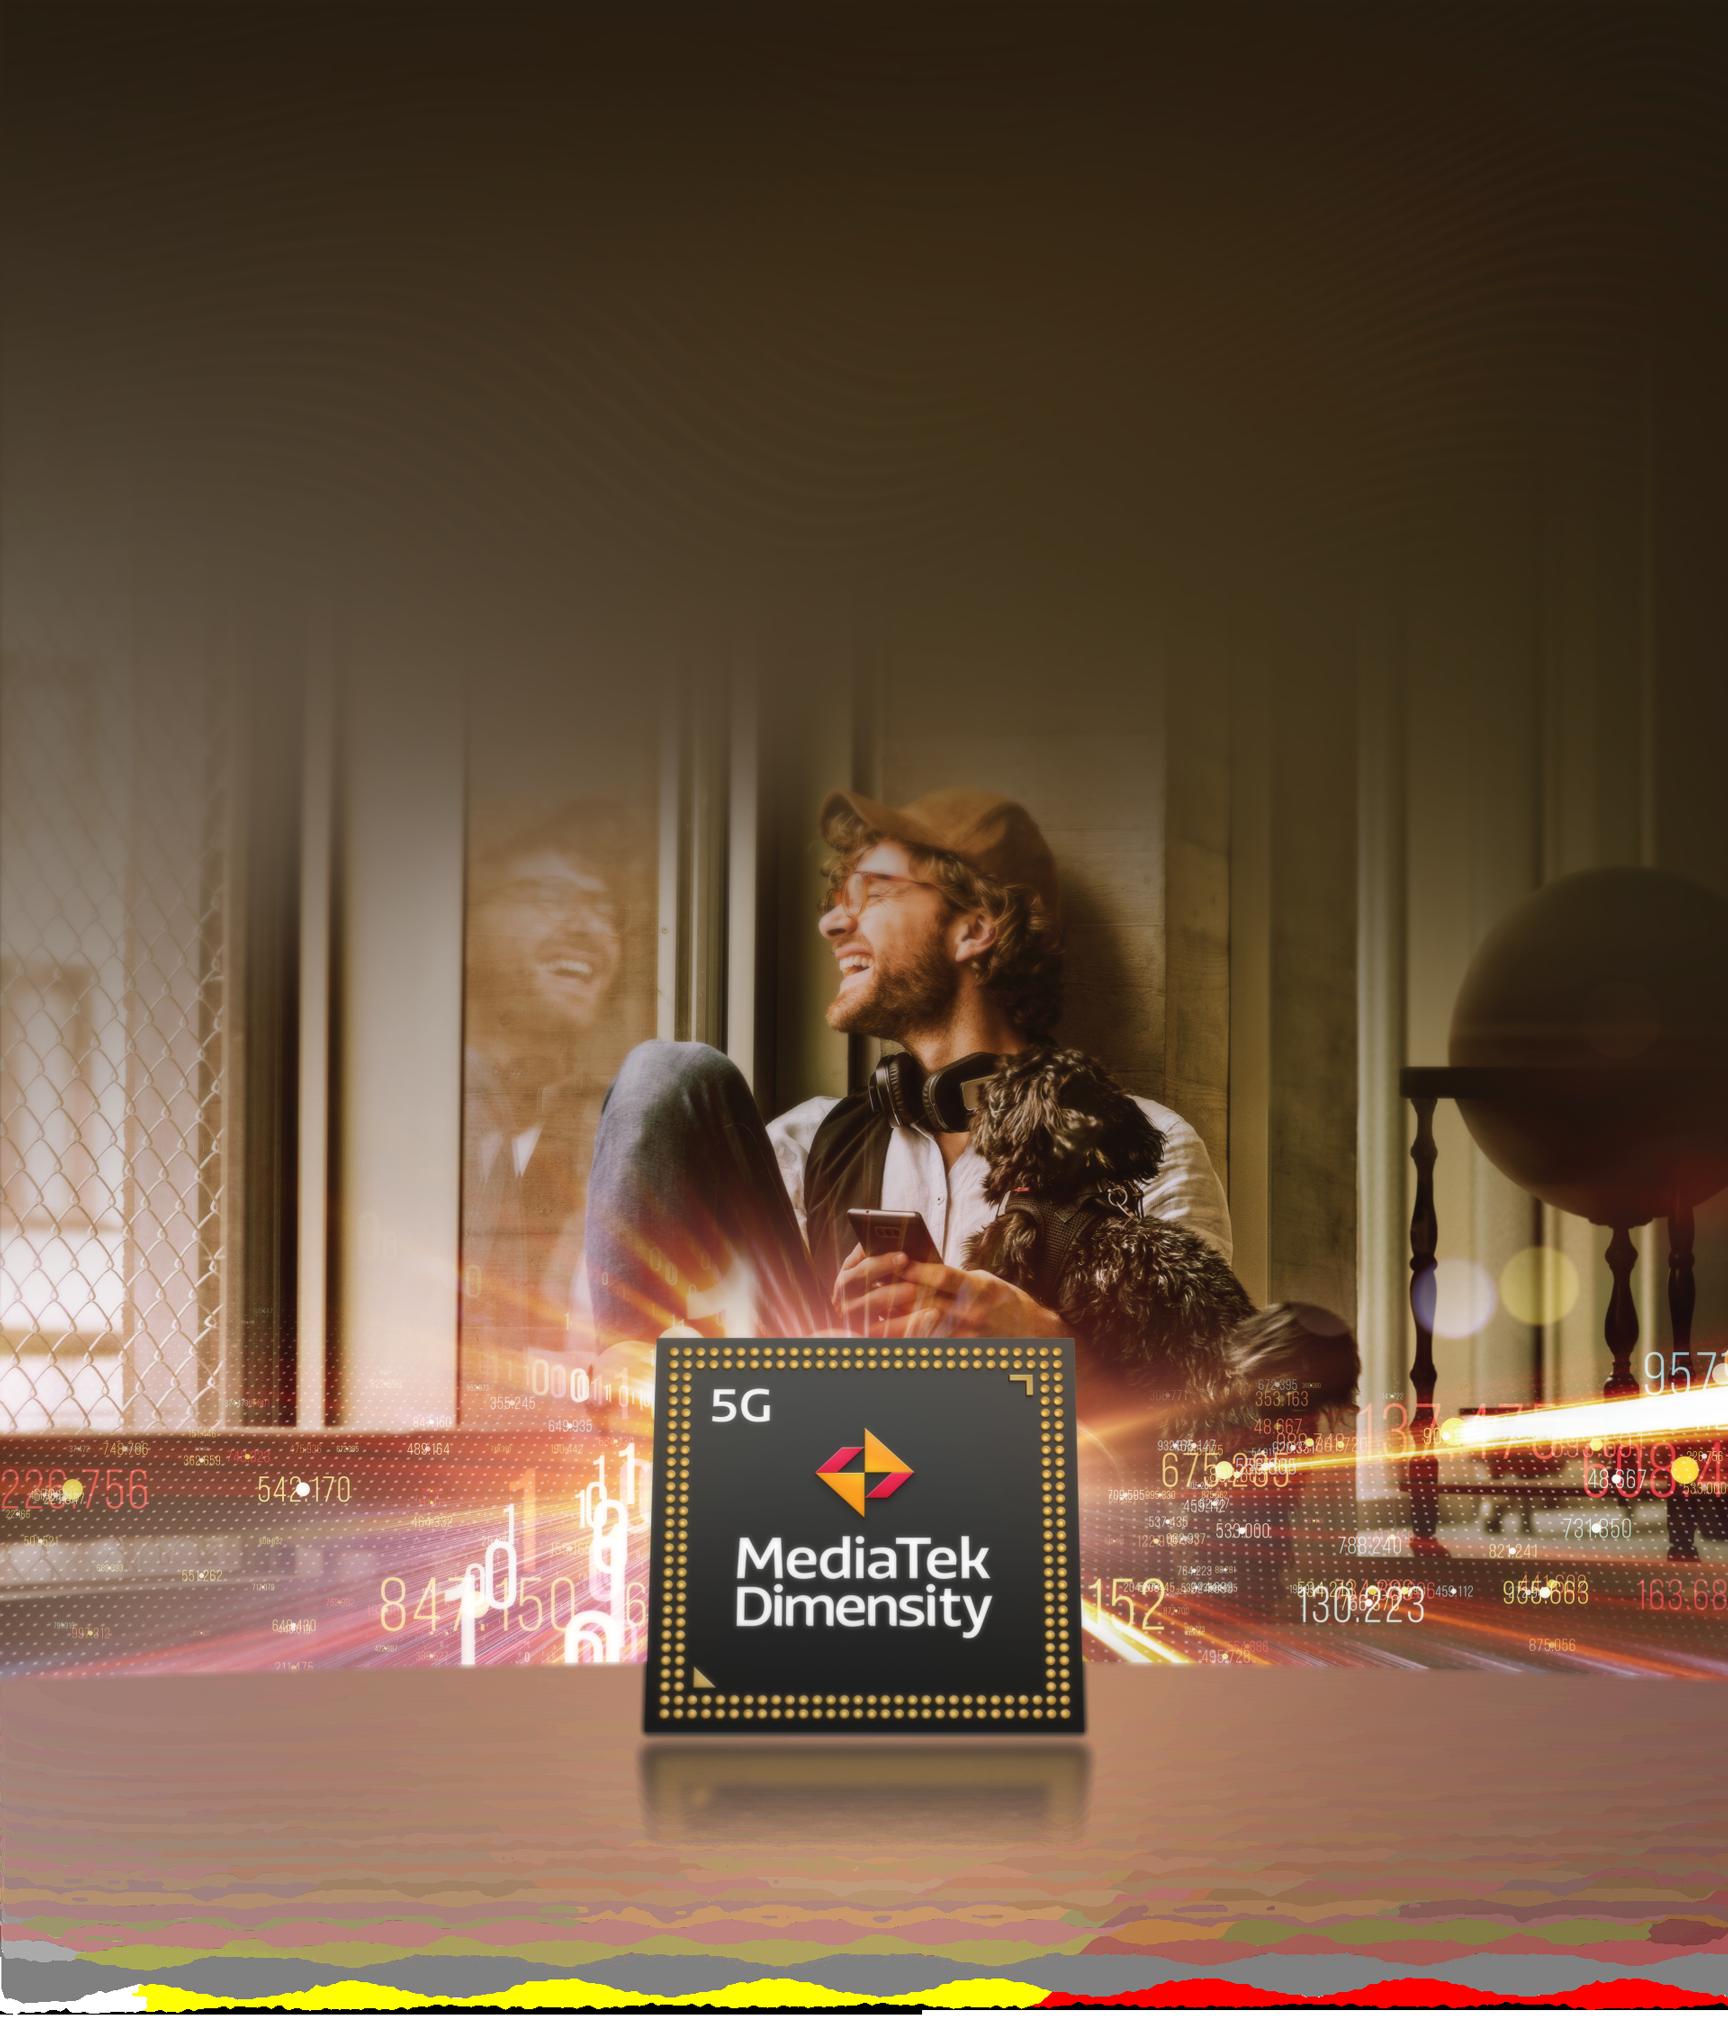 MediaTek anuncia chips Dimensity 920 y Dimensity 810 para teléfonos inteligentes 5G